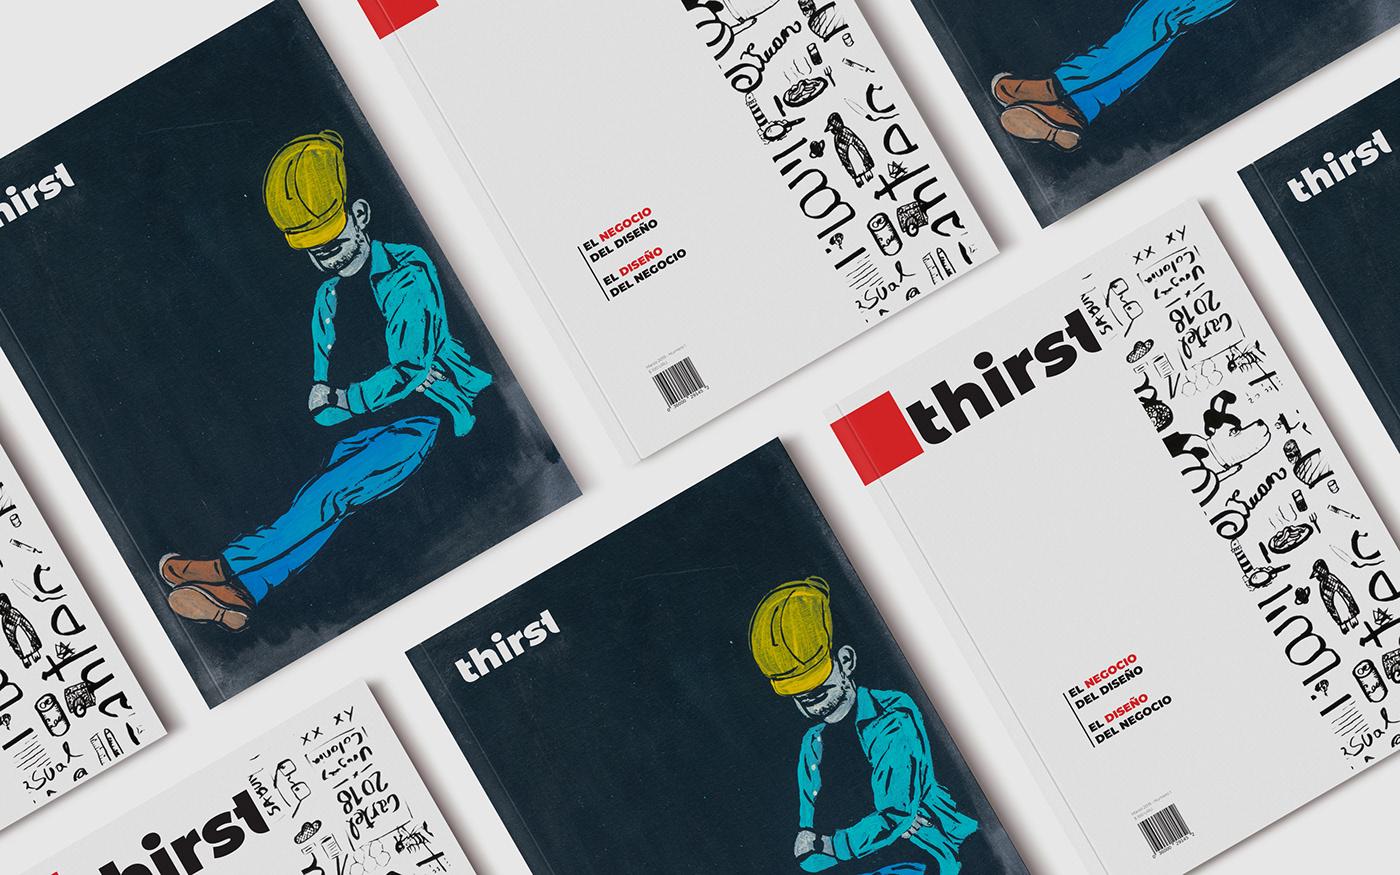 magazine the futur Chris Do thirst ILLUSTRATION  carbajal editorial